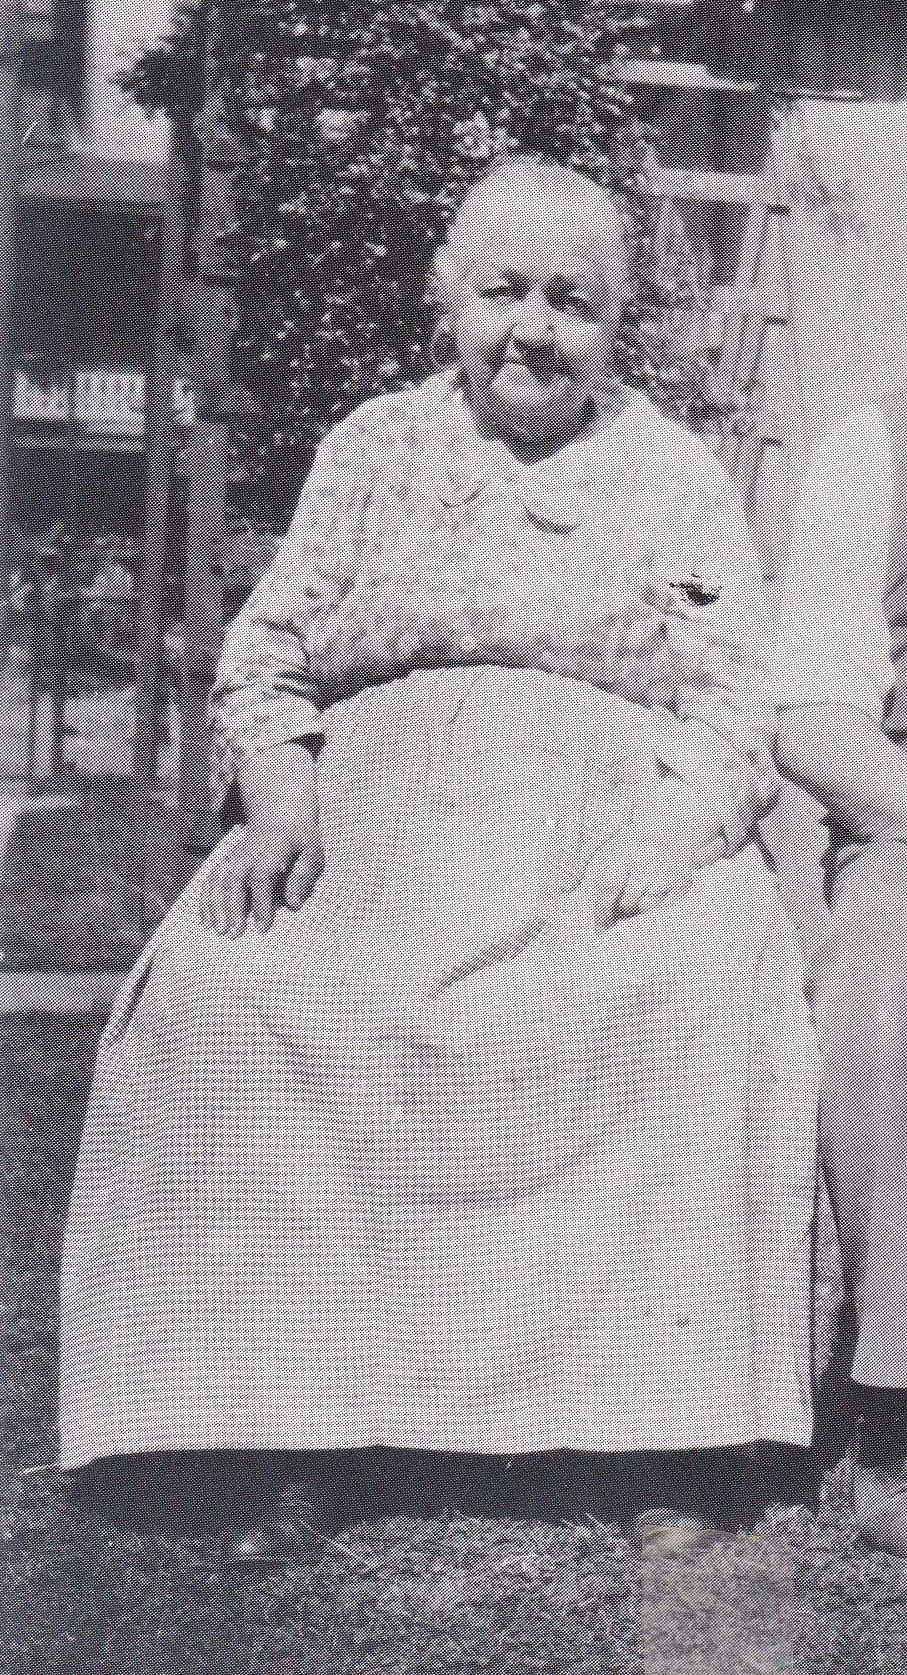 Mary McGovern Cantrel